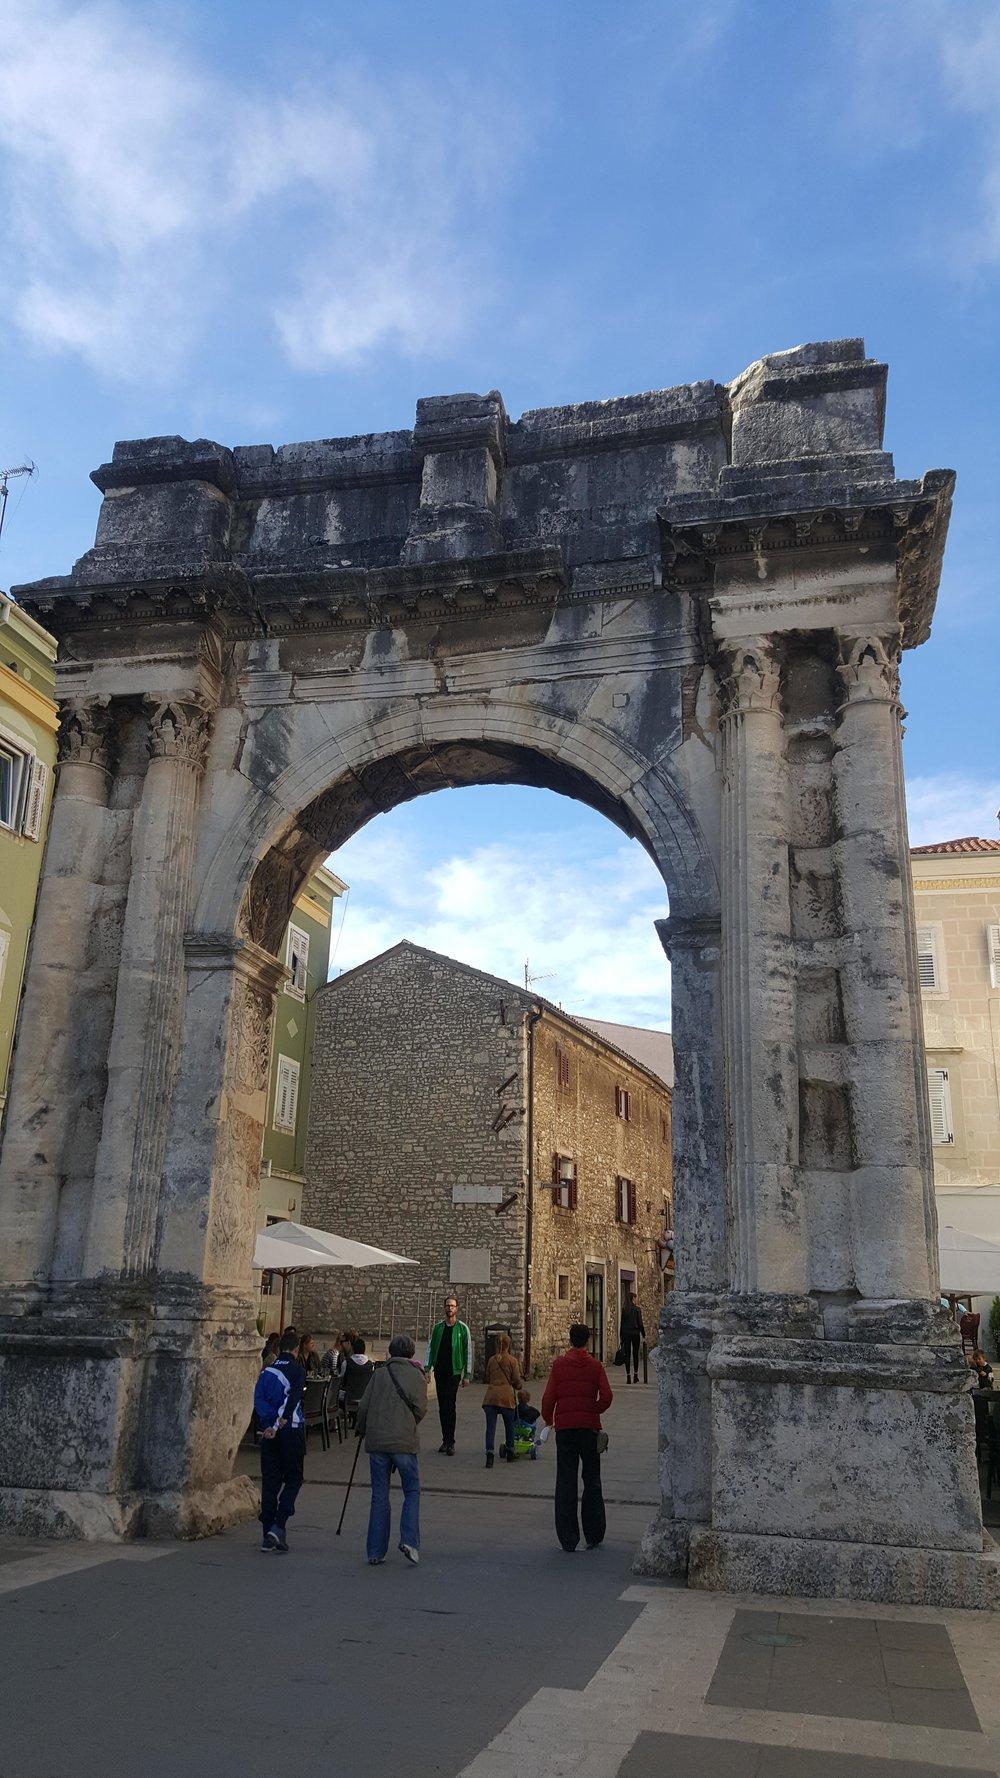 Arch of Sergeii